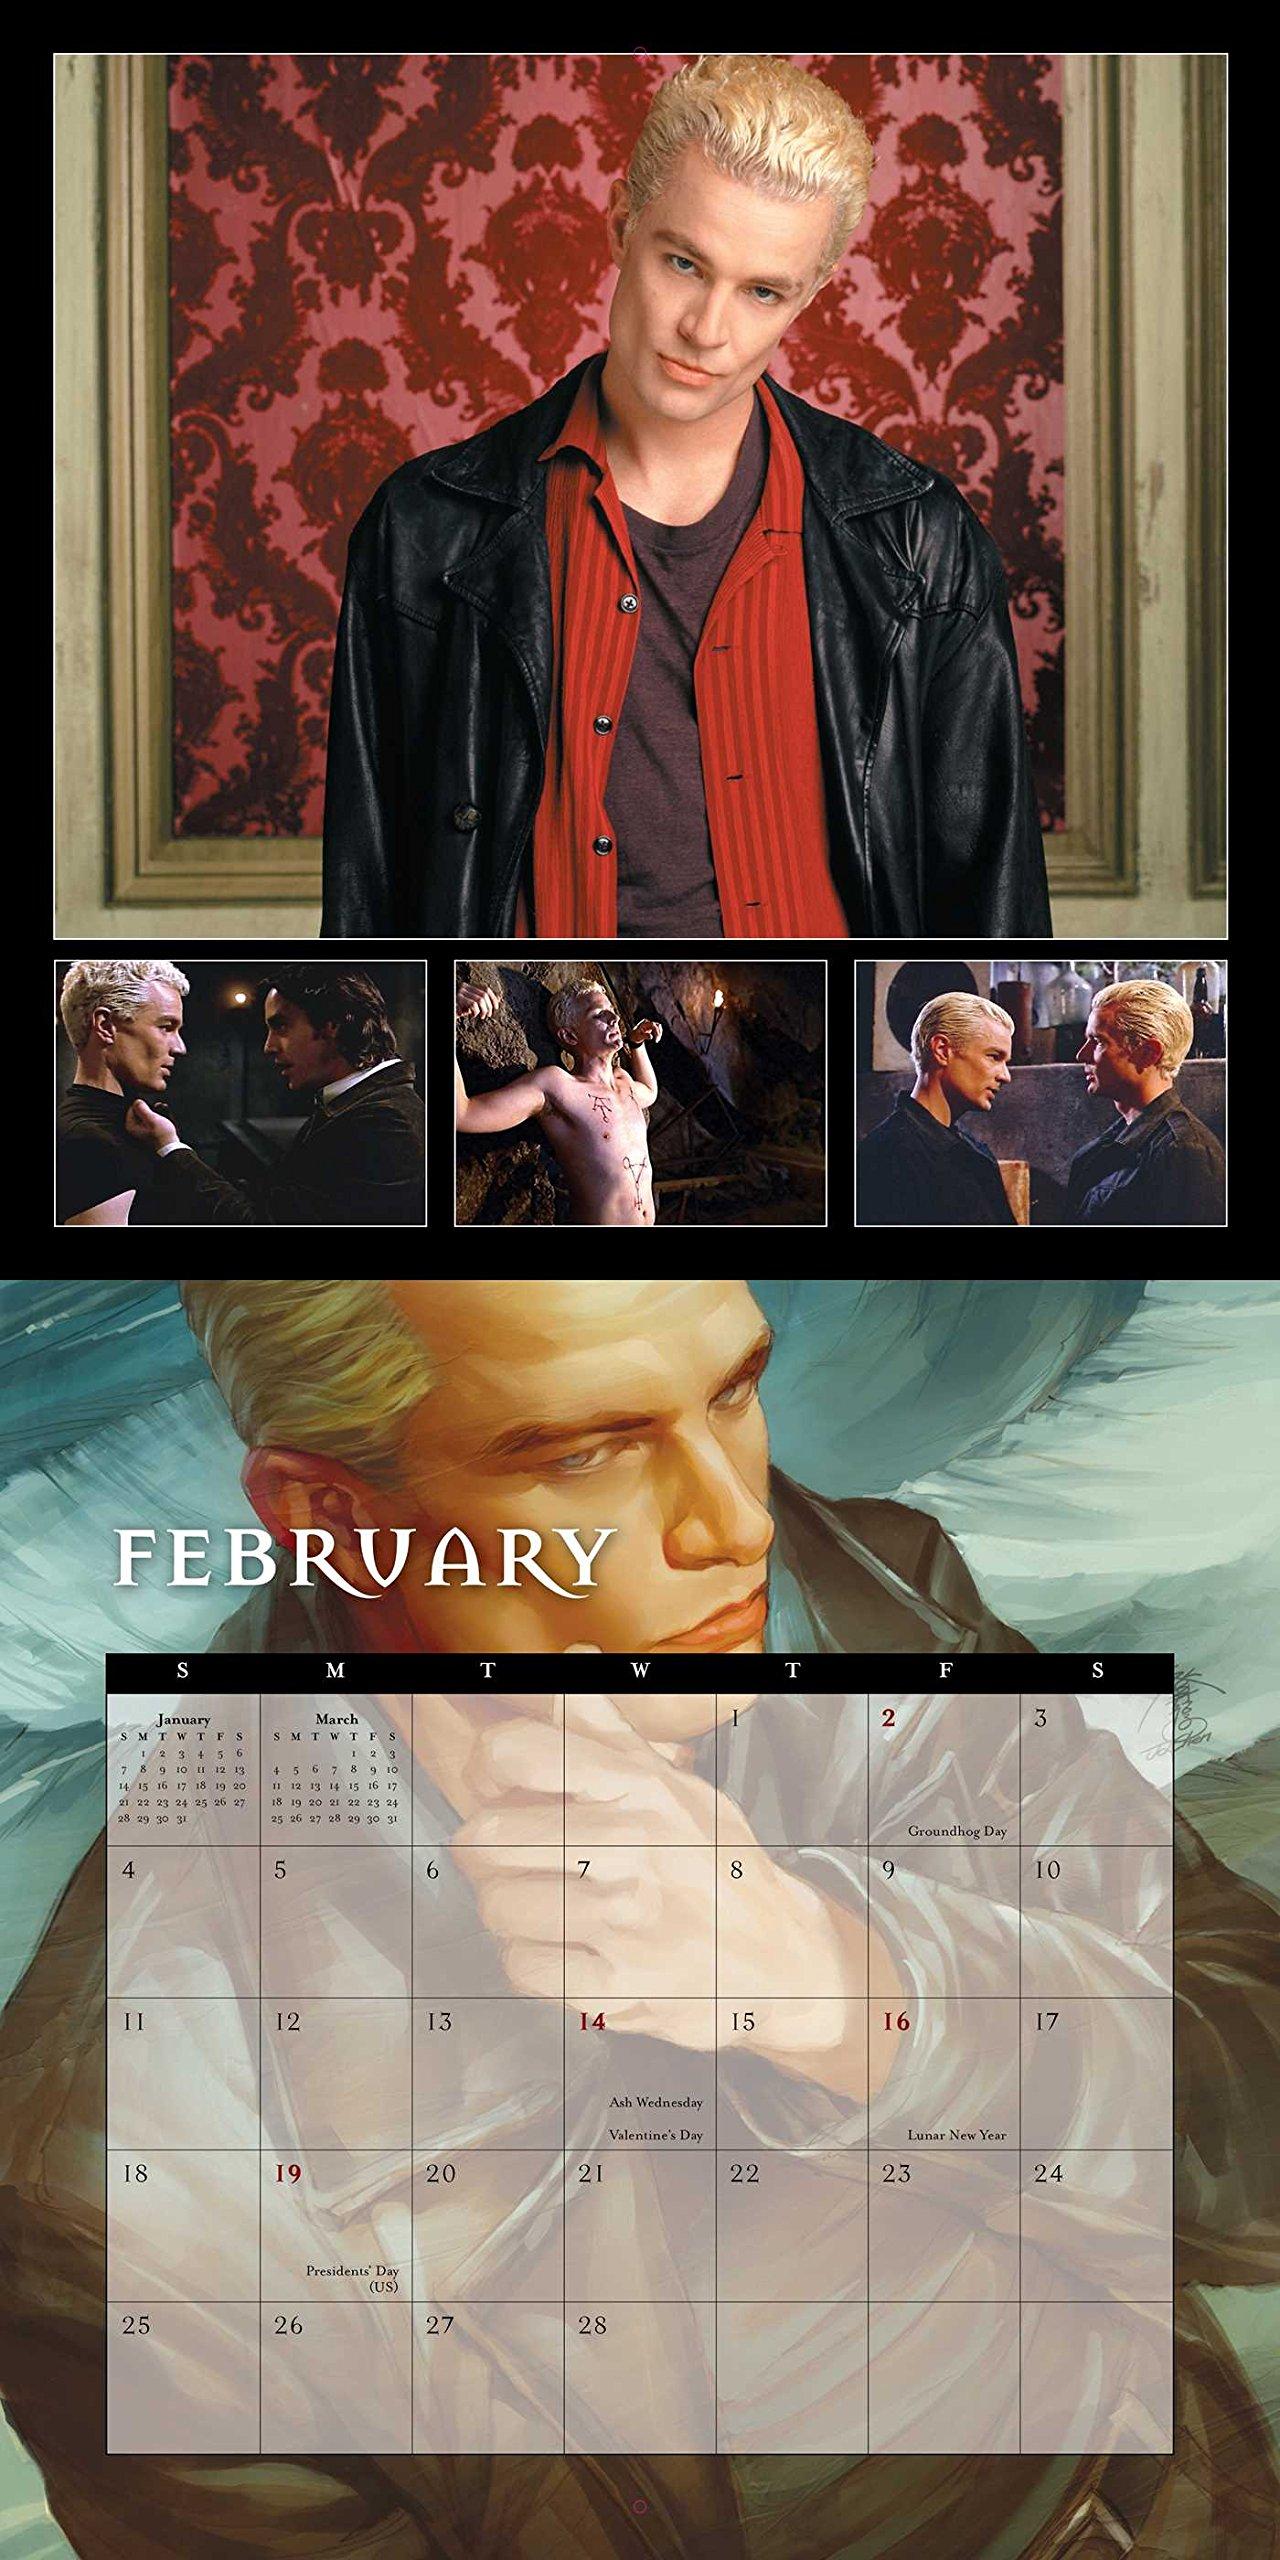 Buffy the Vampire Slayer 2018 Wall Calendar: 20 Years of Slaying: 20th  Century Fox: 9780789333629: Amazon.com: Books